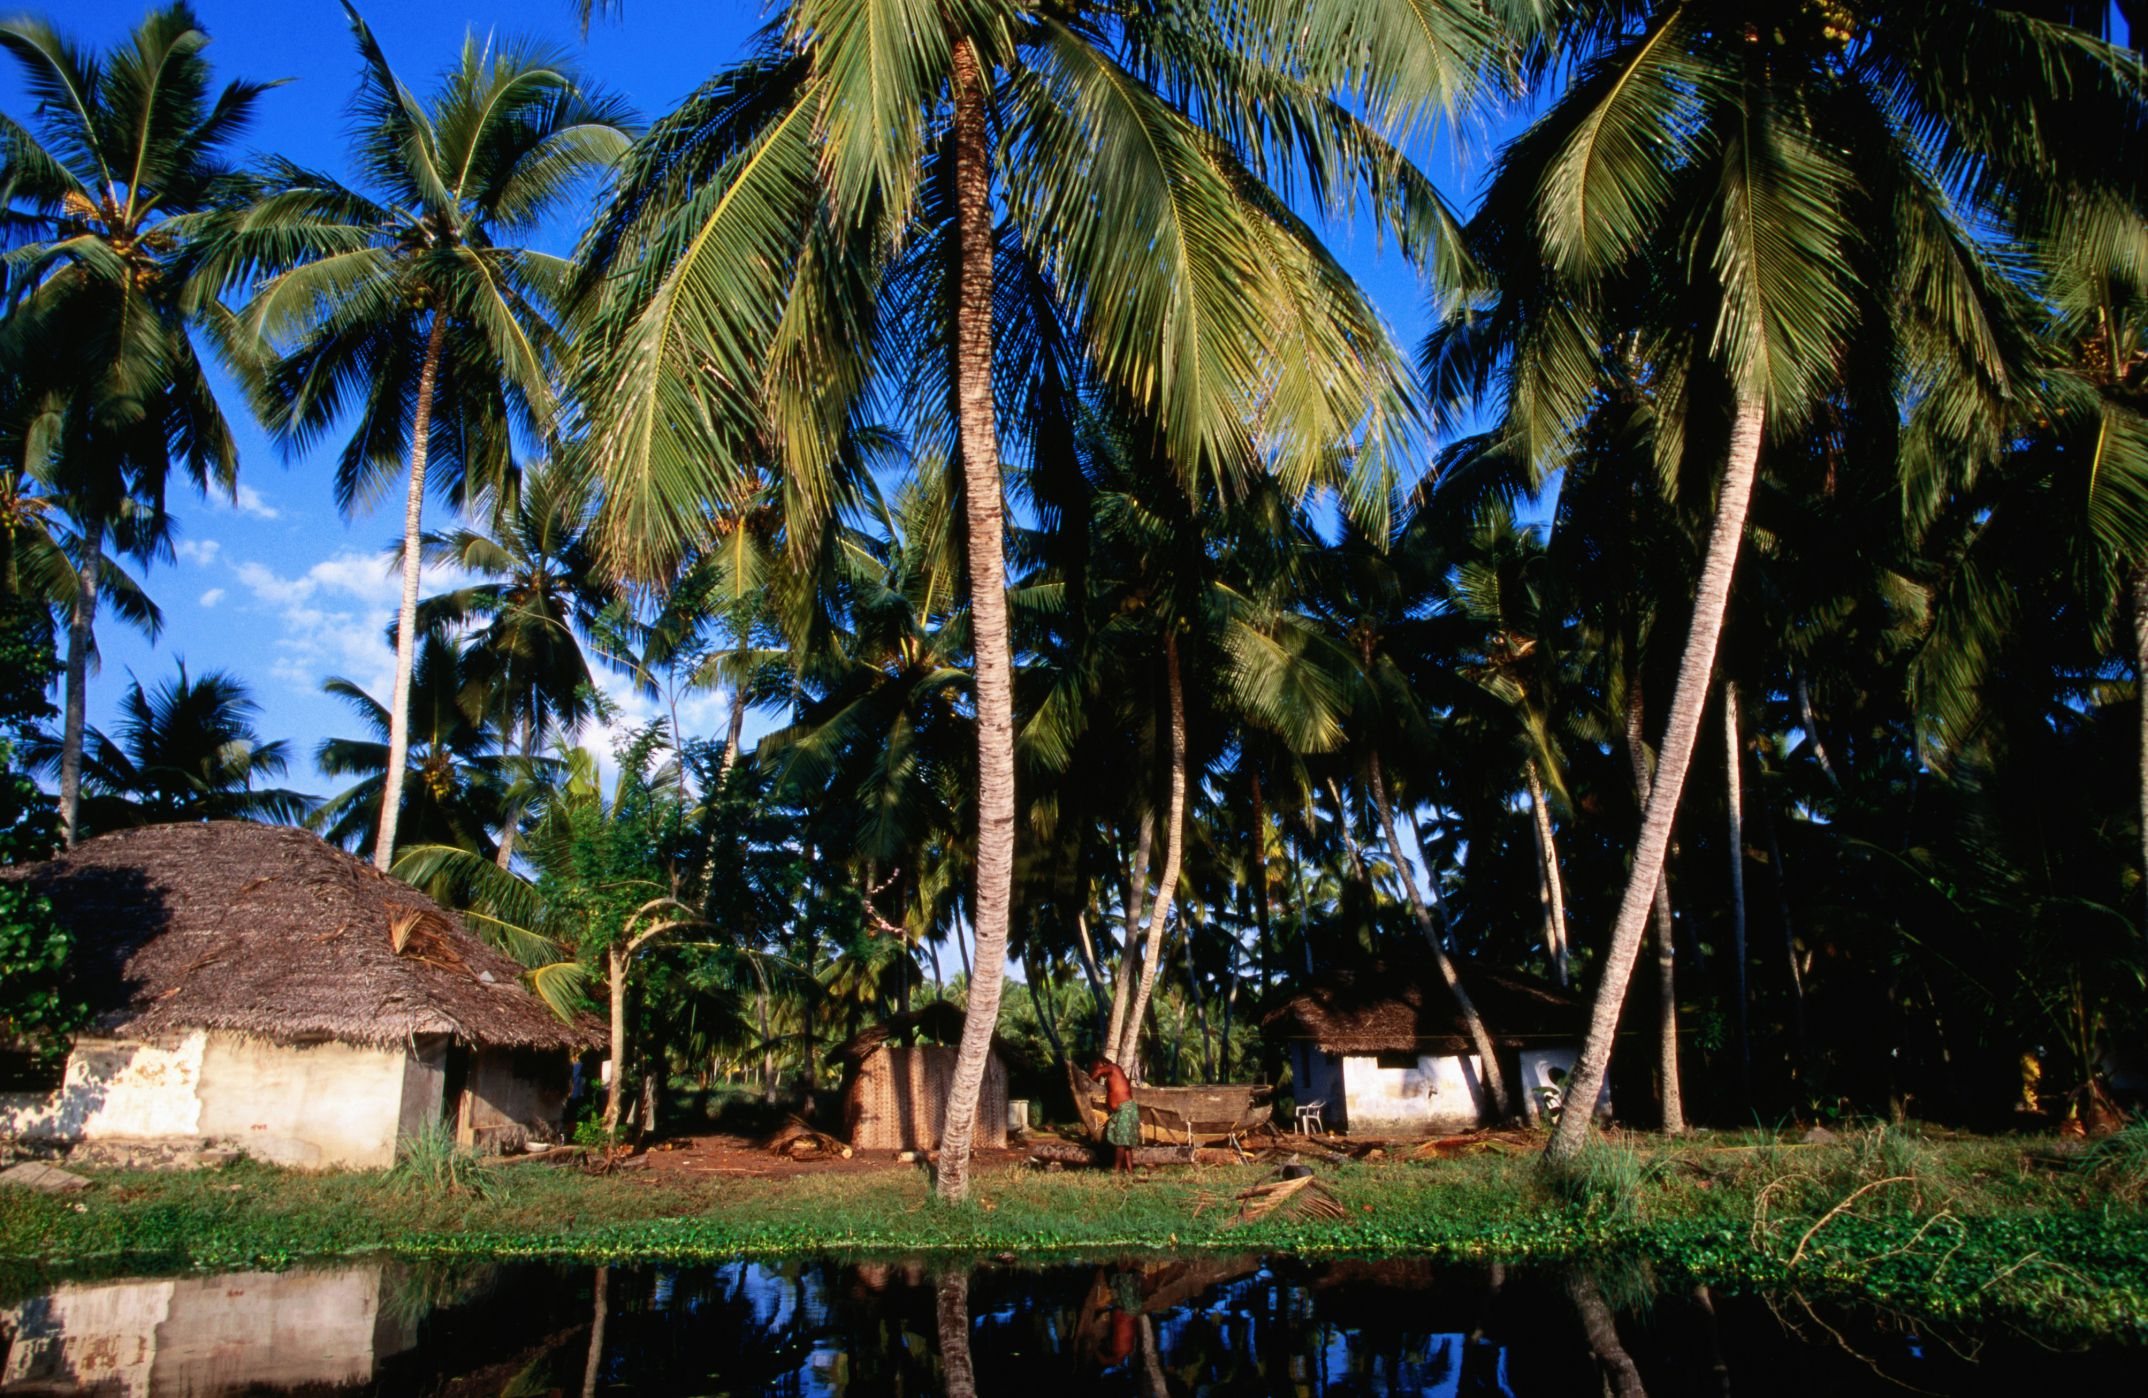 Village along the Kerala backwaters